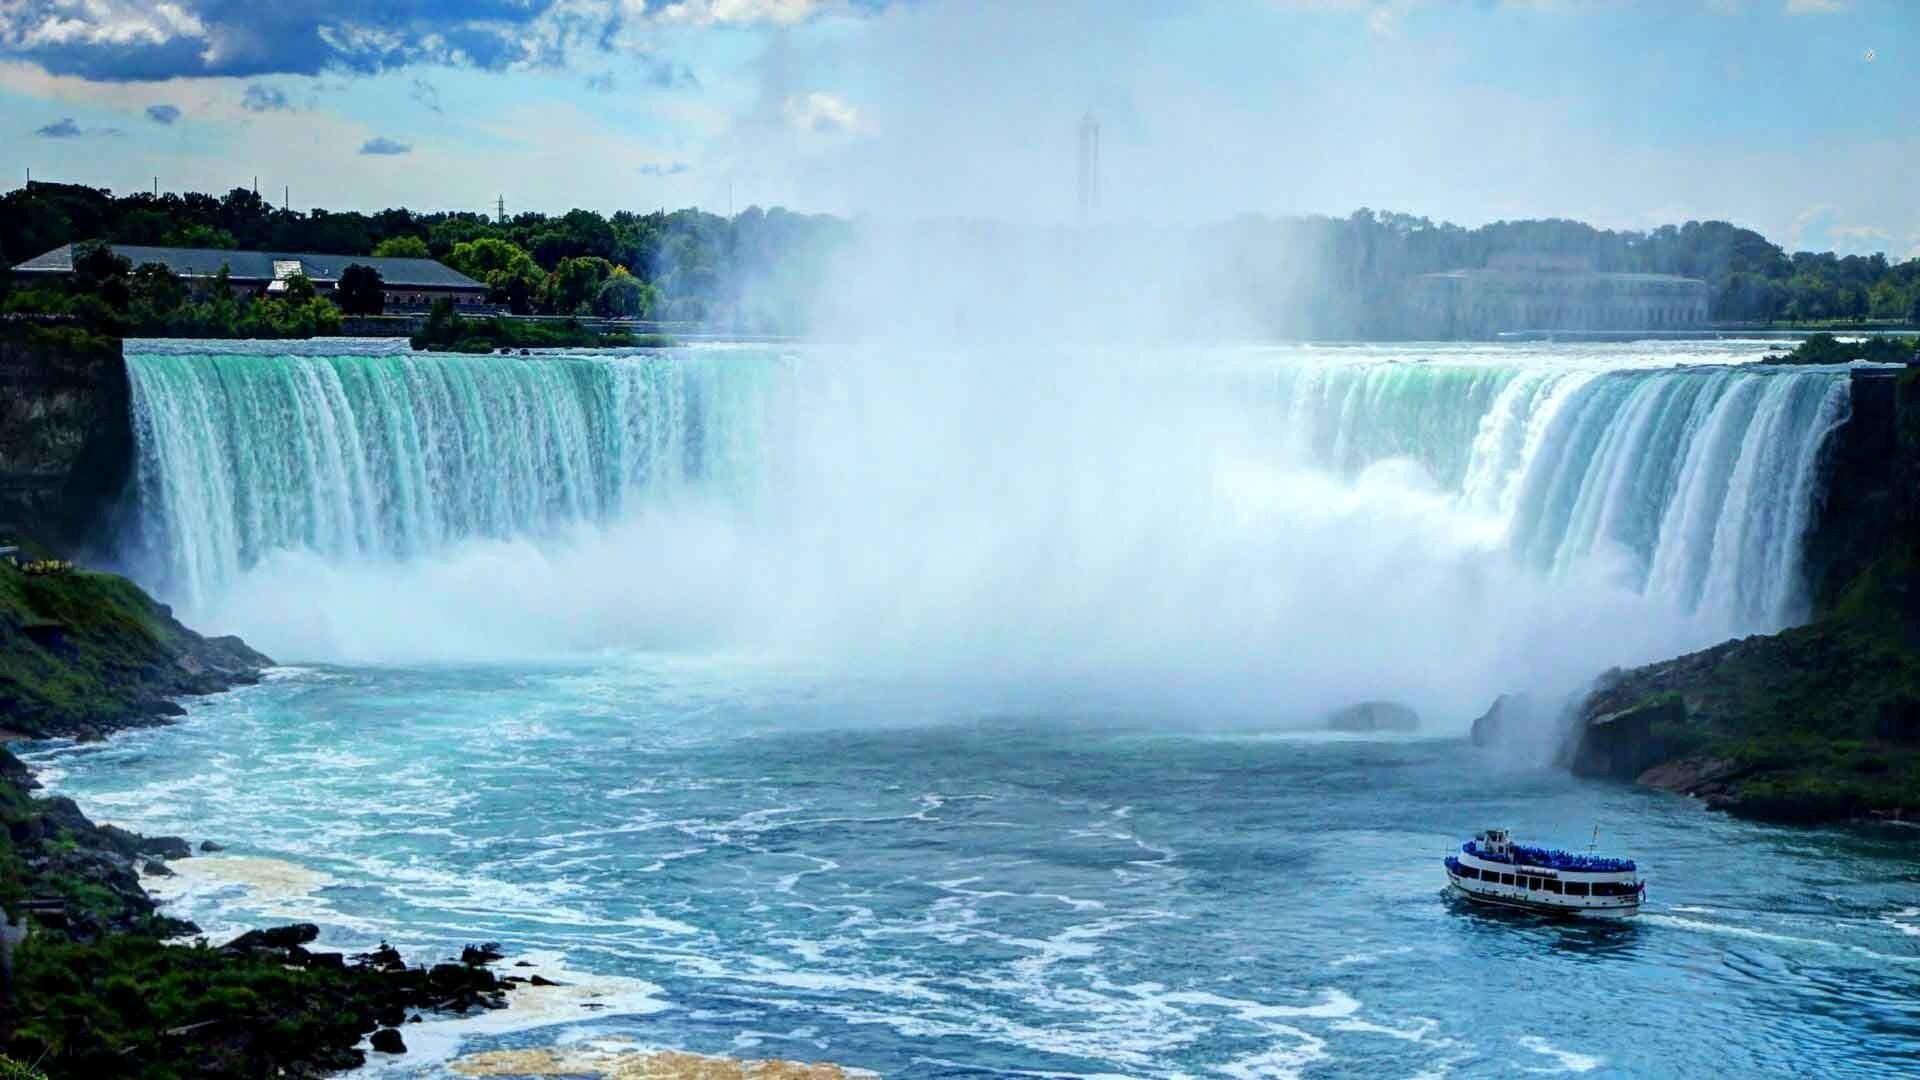 Amazing Look Of Niagara Falls In Us Wallpaper Hd Wallpapers